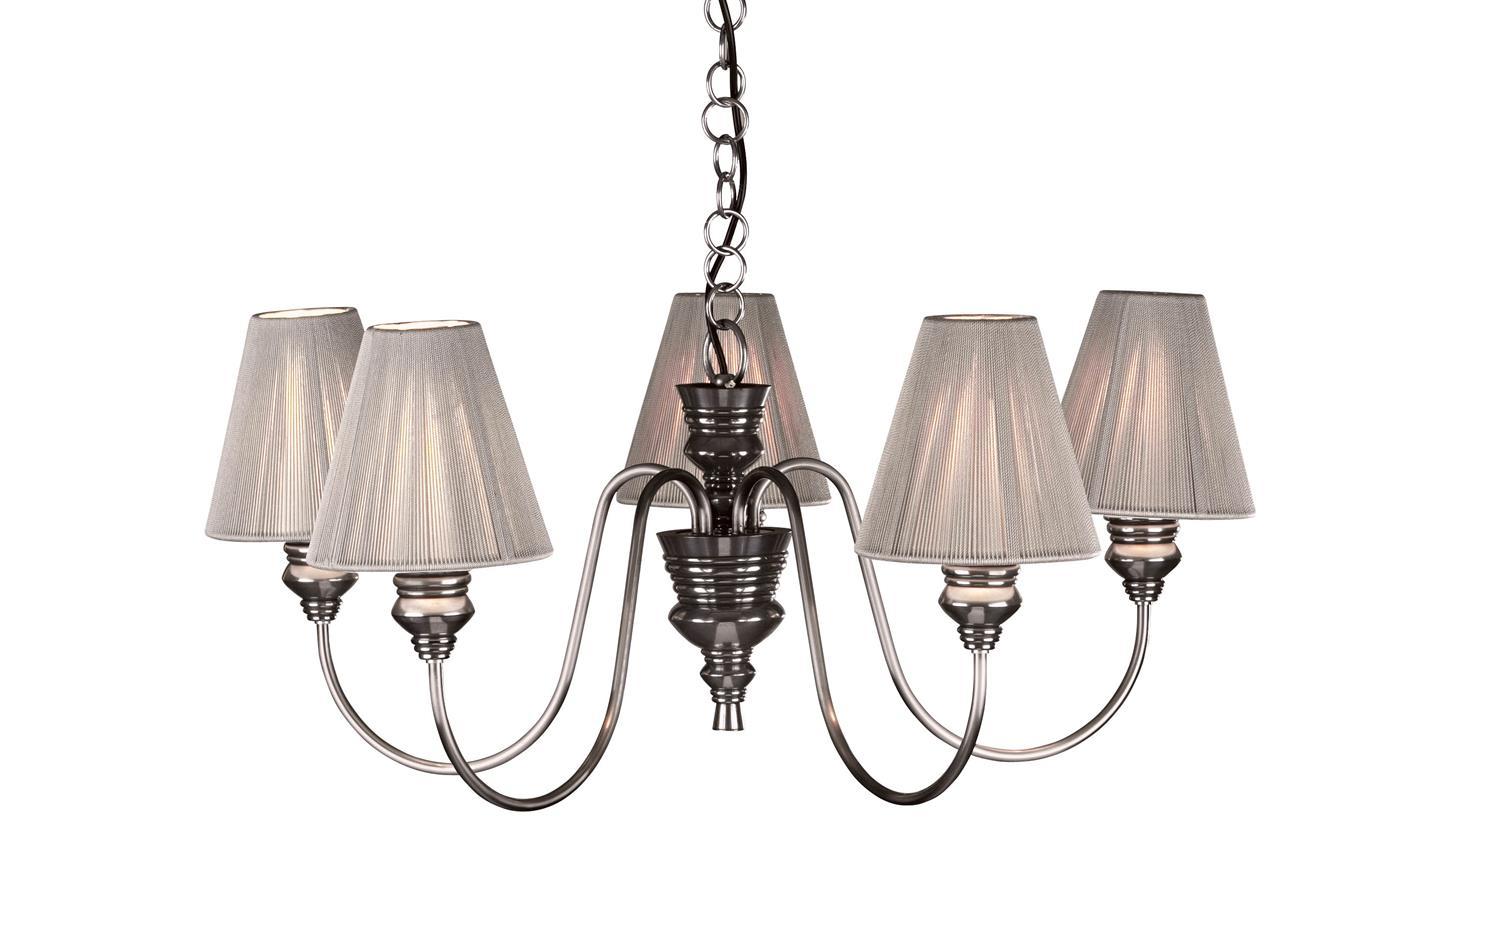 David Hunt Lighting DOR0567 Doreen 5 Light Pendant in Pewter with Silver Shades